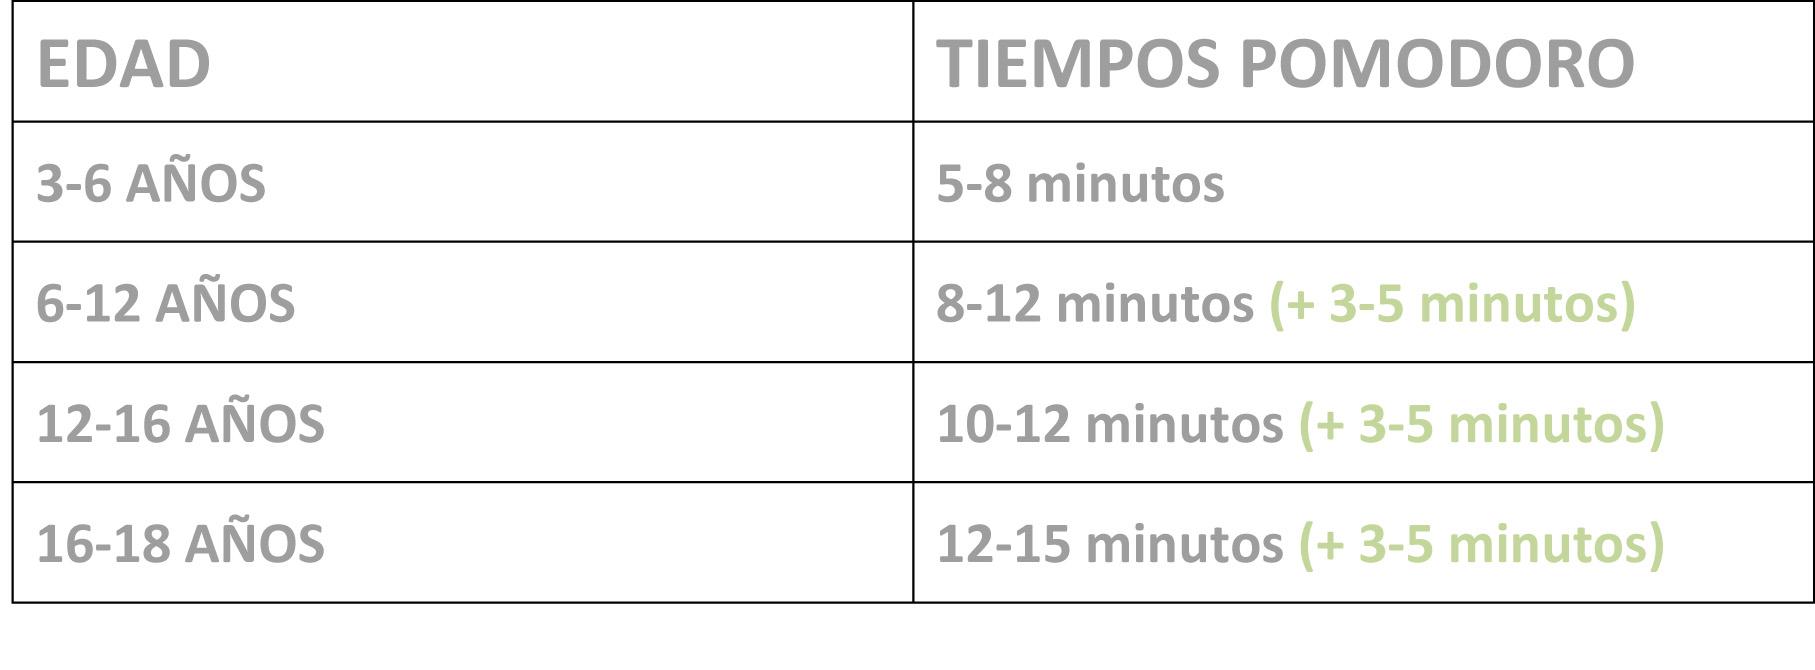 Tabla tiempo pomodoro